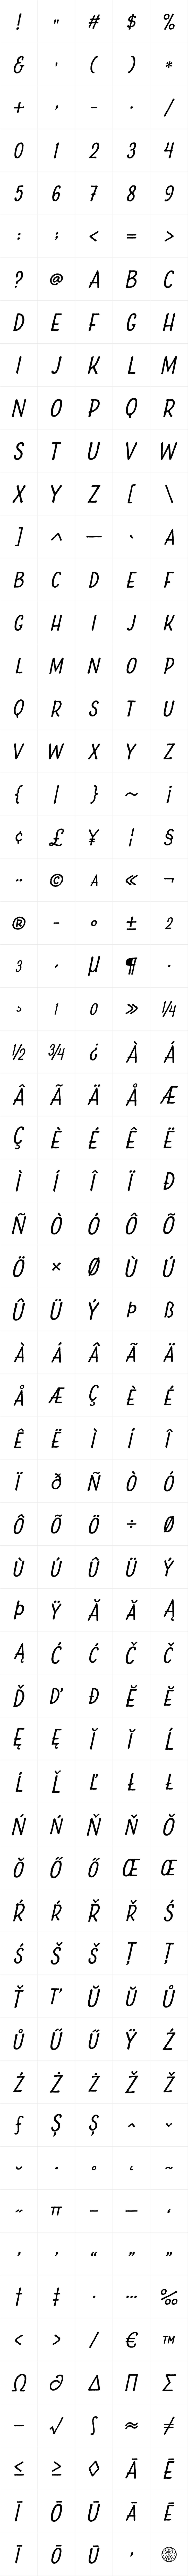 Charcuterie Sans Italic